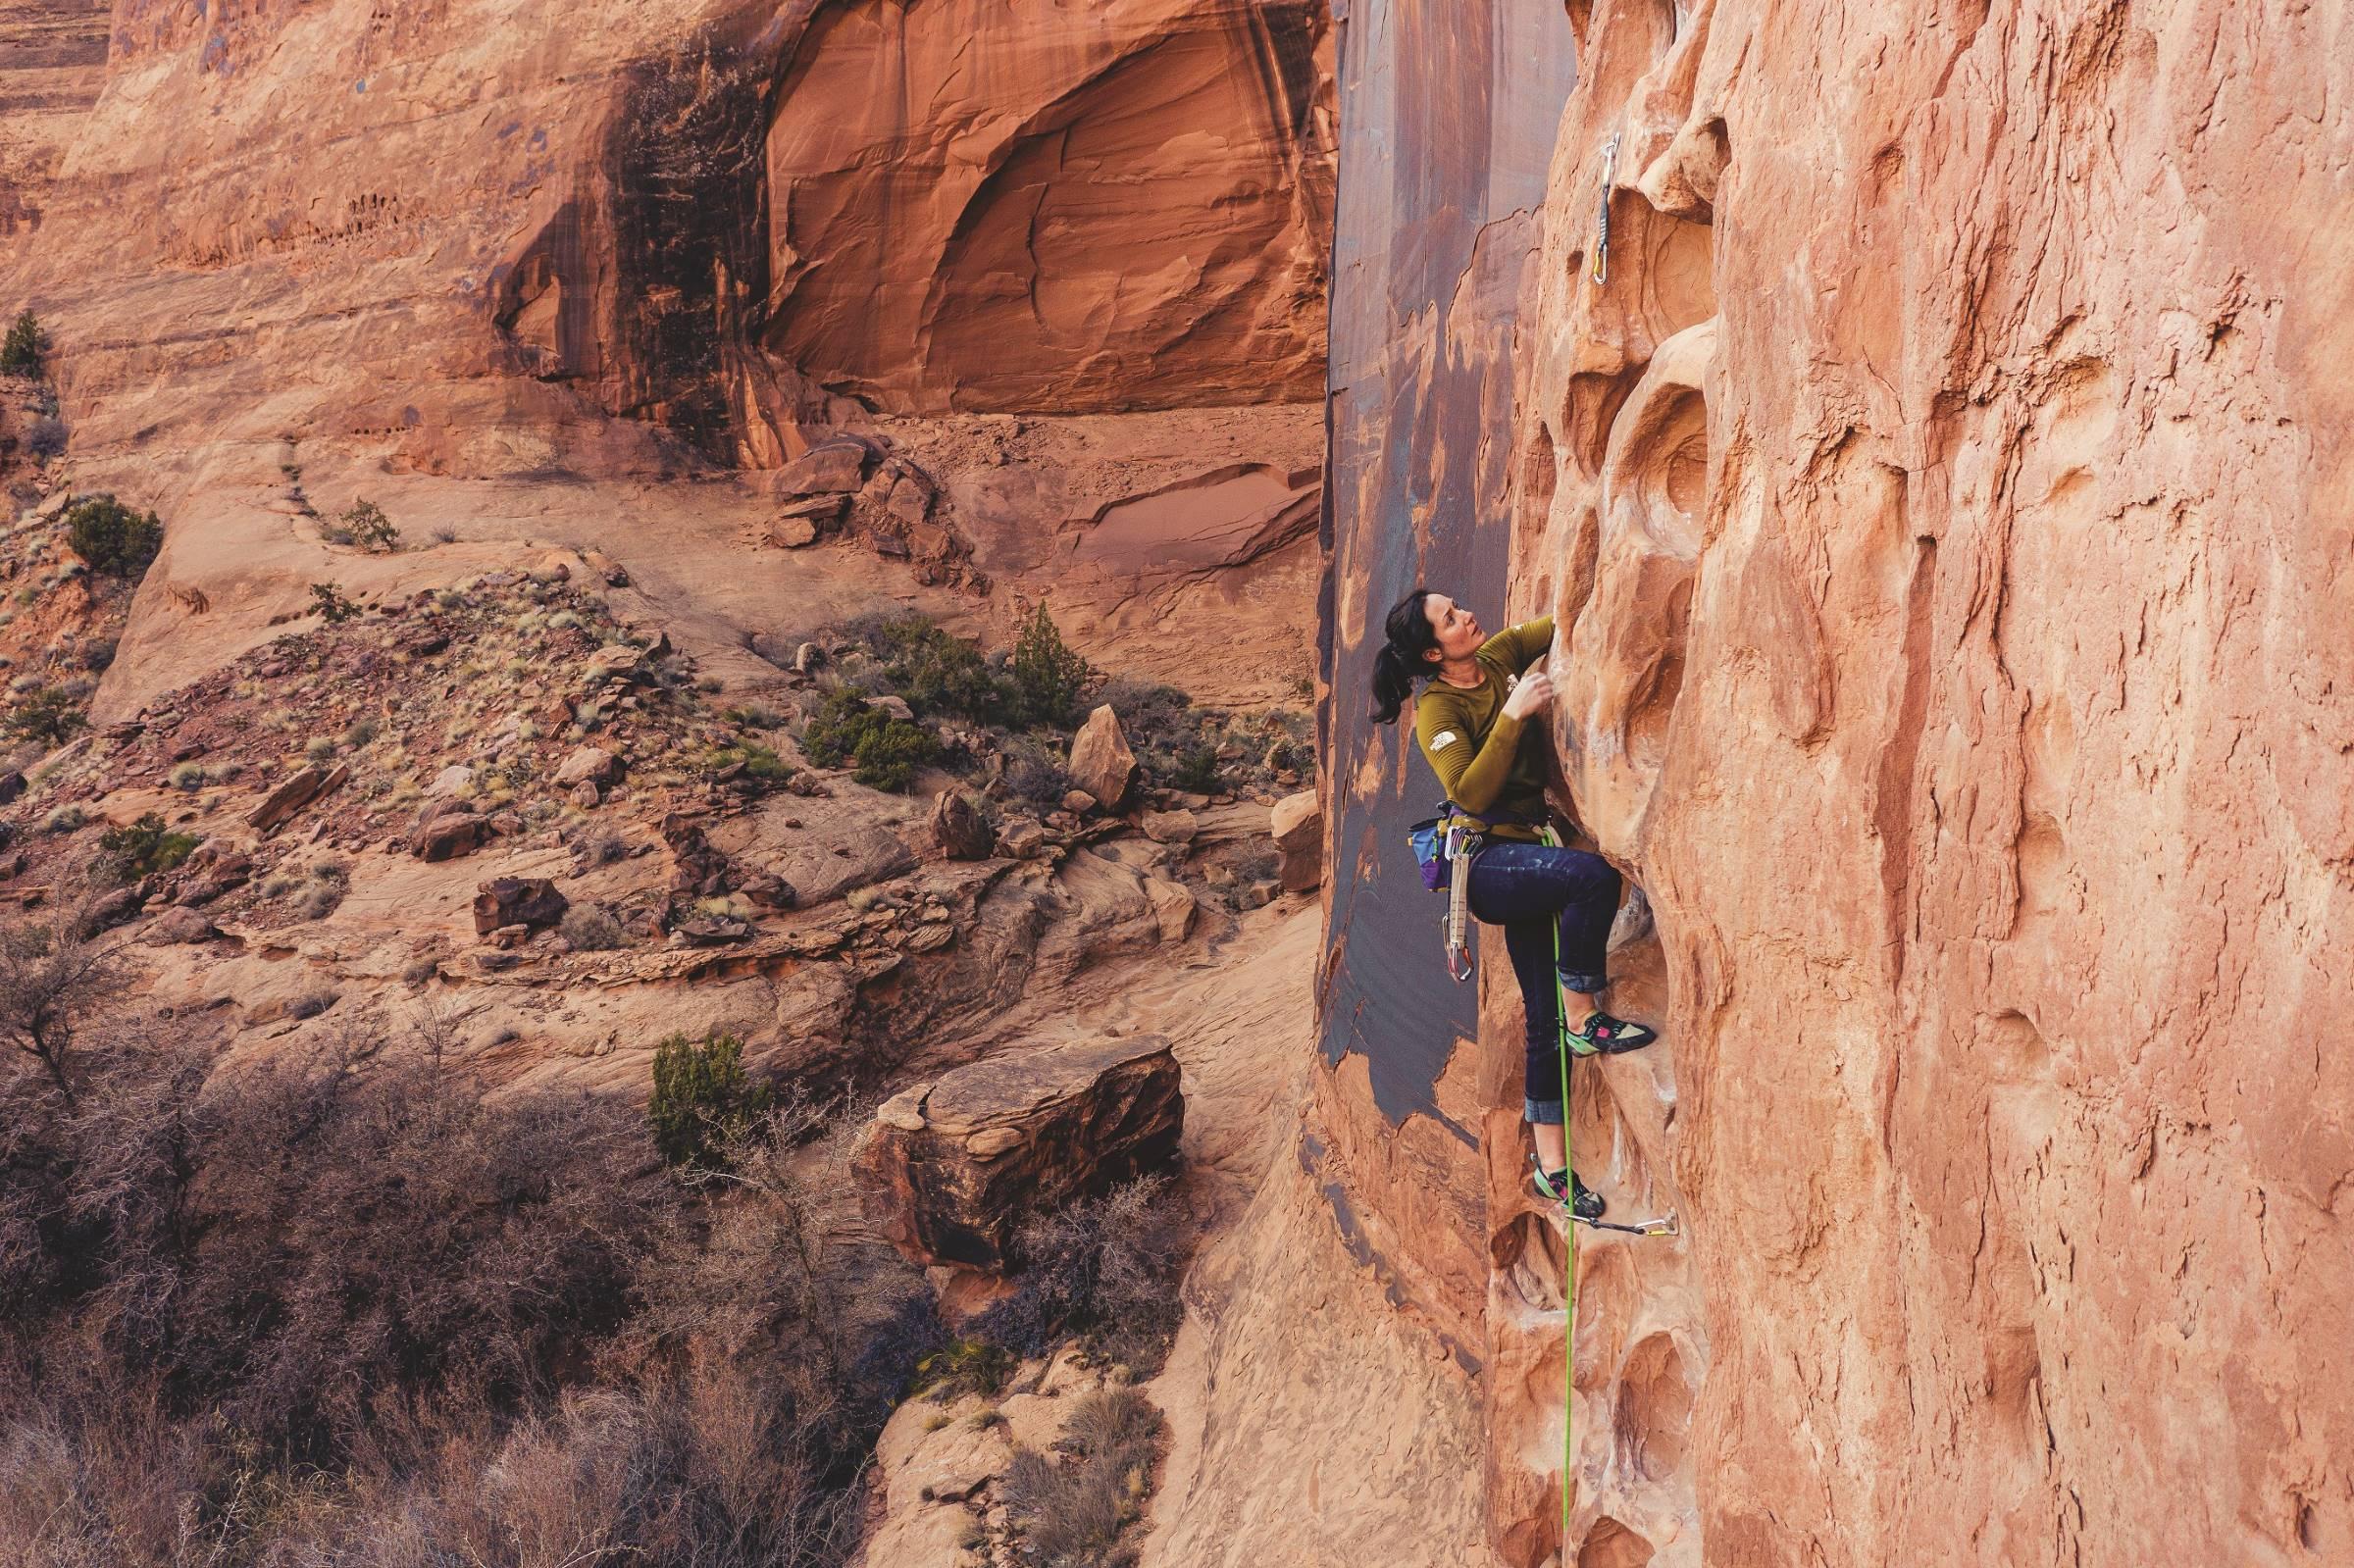 sterling xero climbing rope